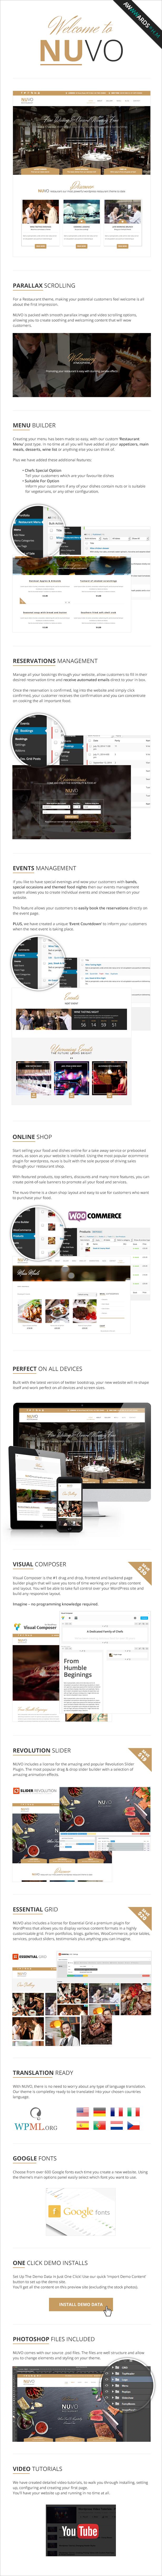 nuvo3 - NUVO - Cafe & Restaurant WordPress Theme - Multiple Restaurant & Bistro Demos